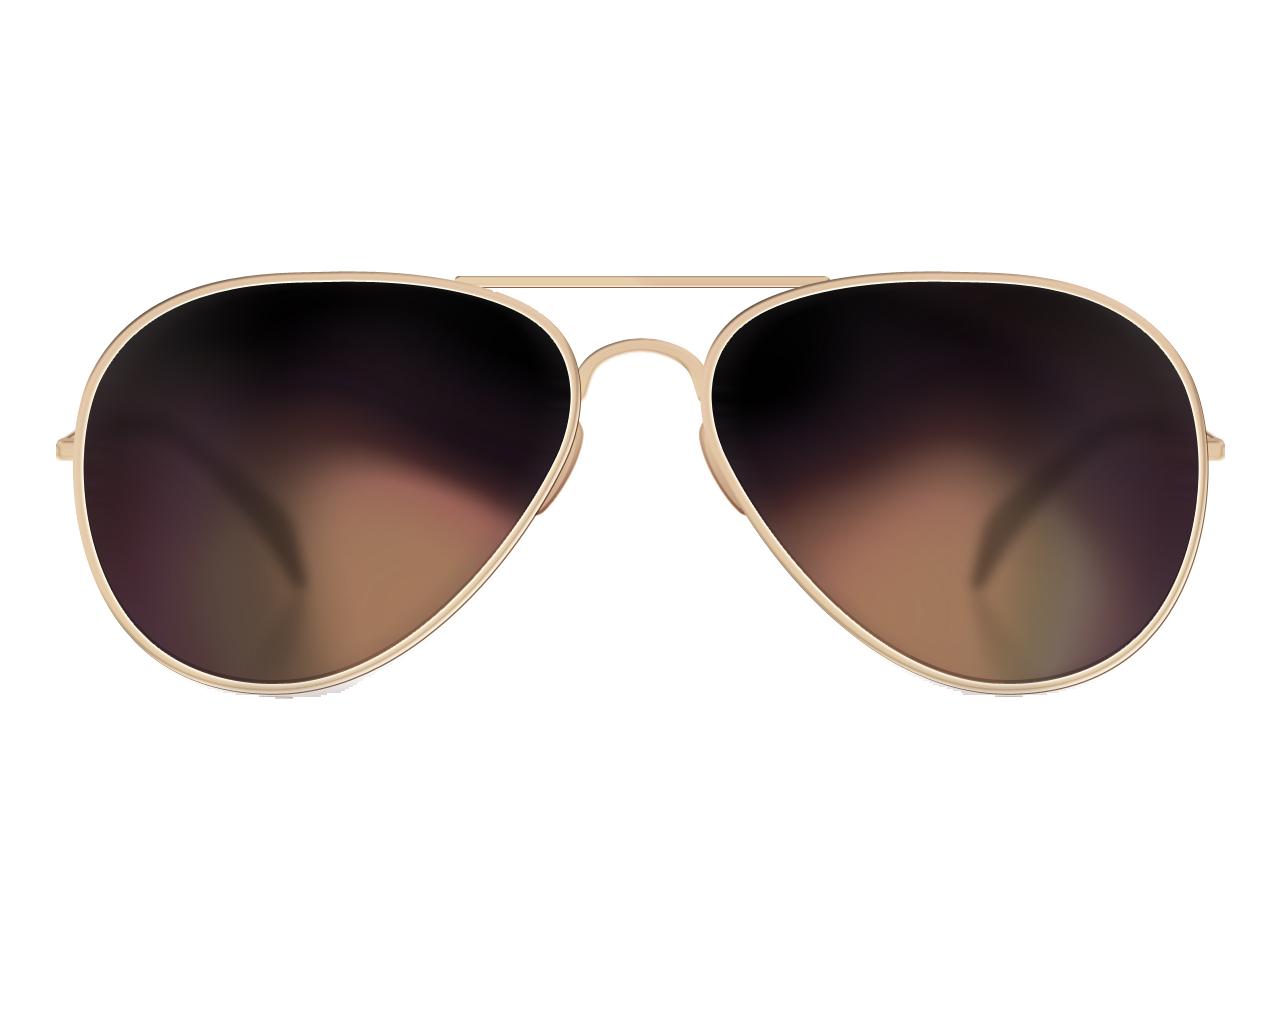 banner freeuse library Aviator clipart mirrored sunglasses. Ray ban wayfarer .